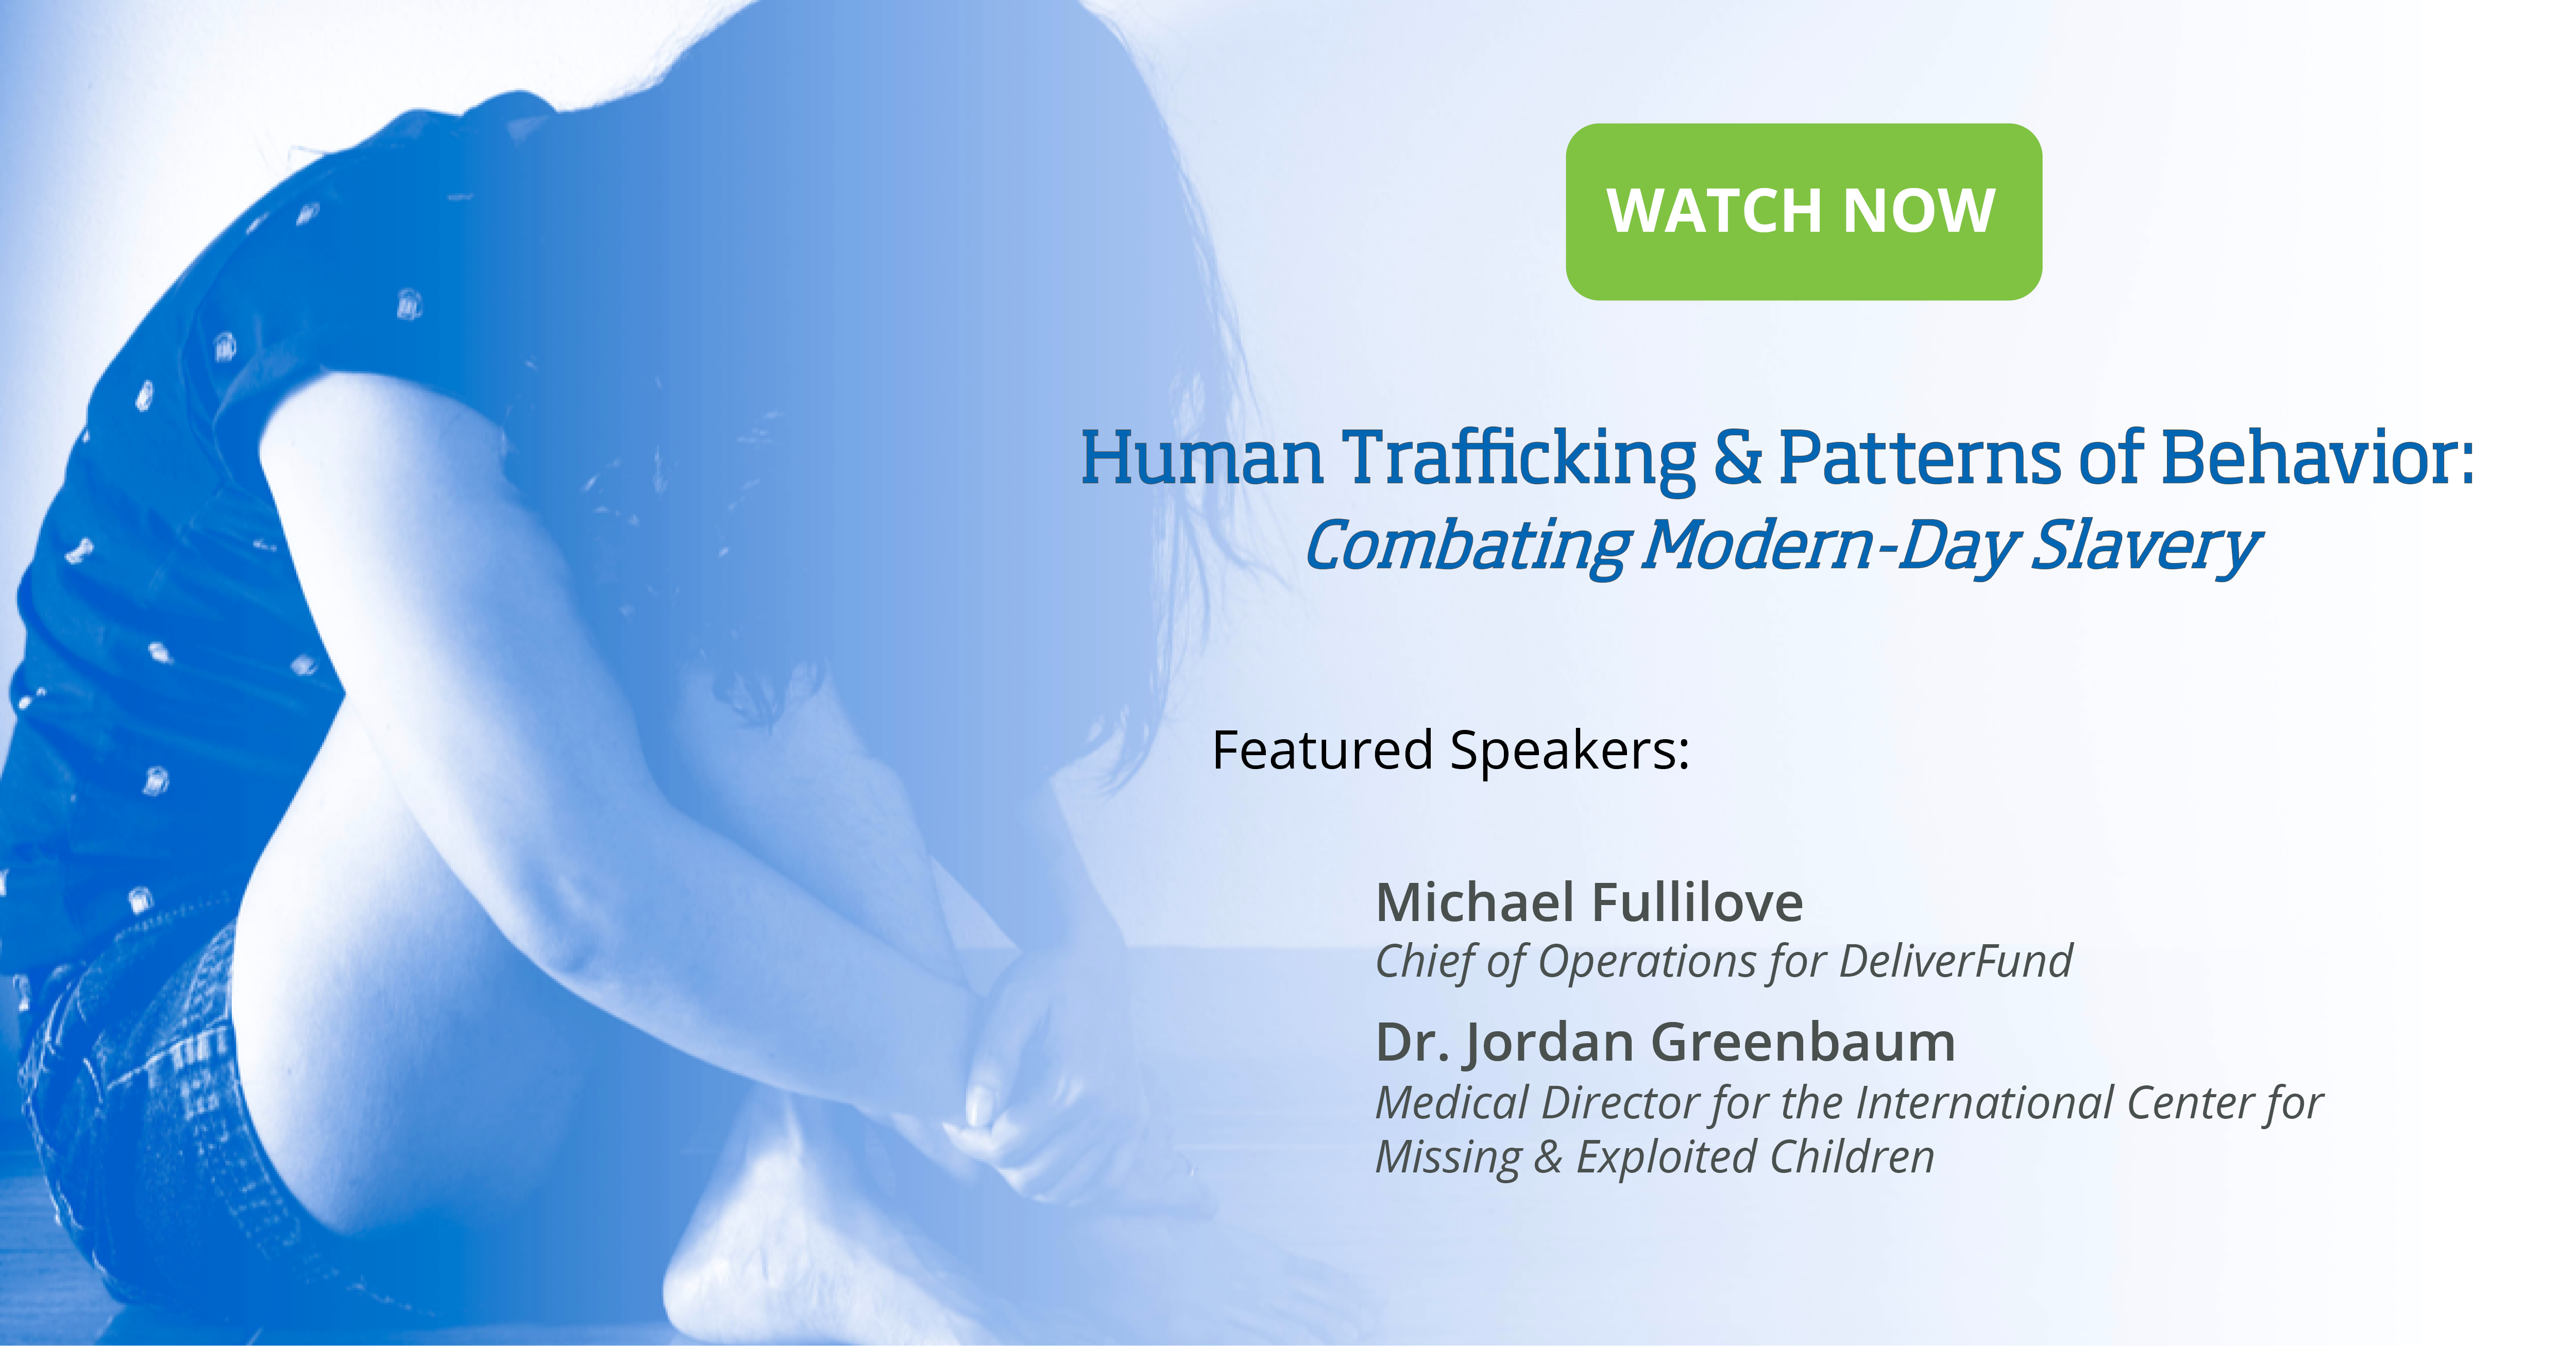 Human Trafficking & Patterns of Behavior Combating Modern-Day Slavery-20200910 1900-1